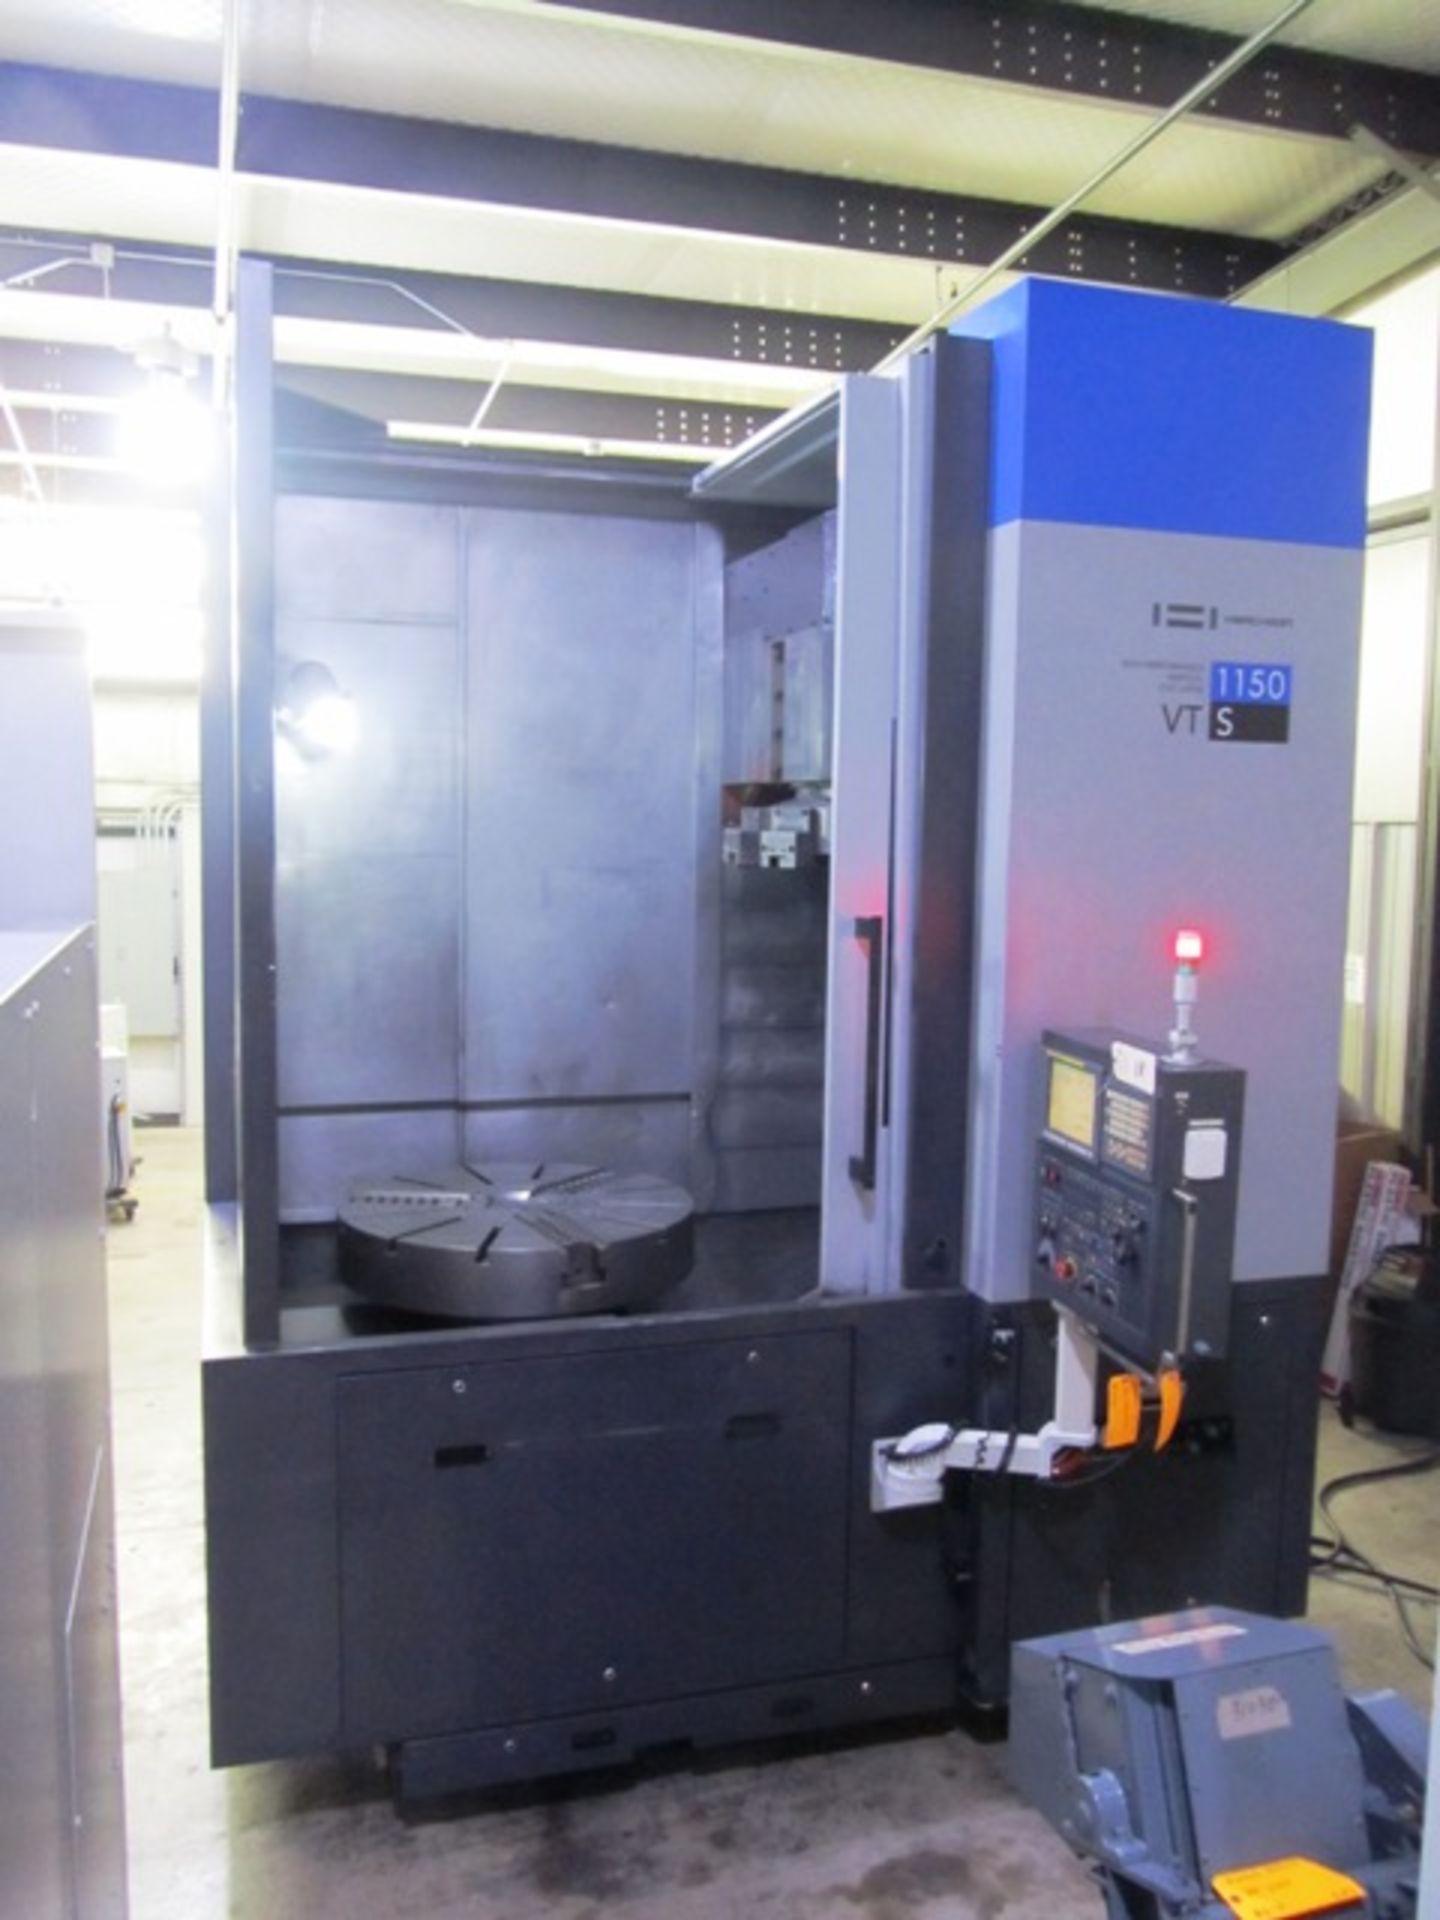 Lot 18 - Hwacheon VTS 1150 CNC Vertical Turning Center